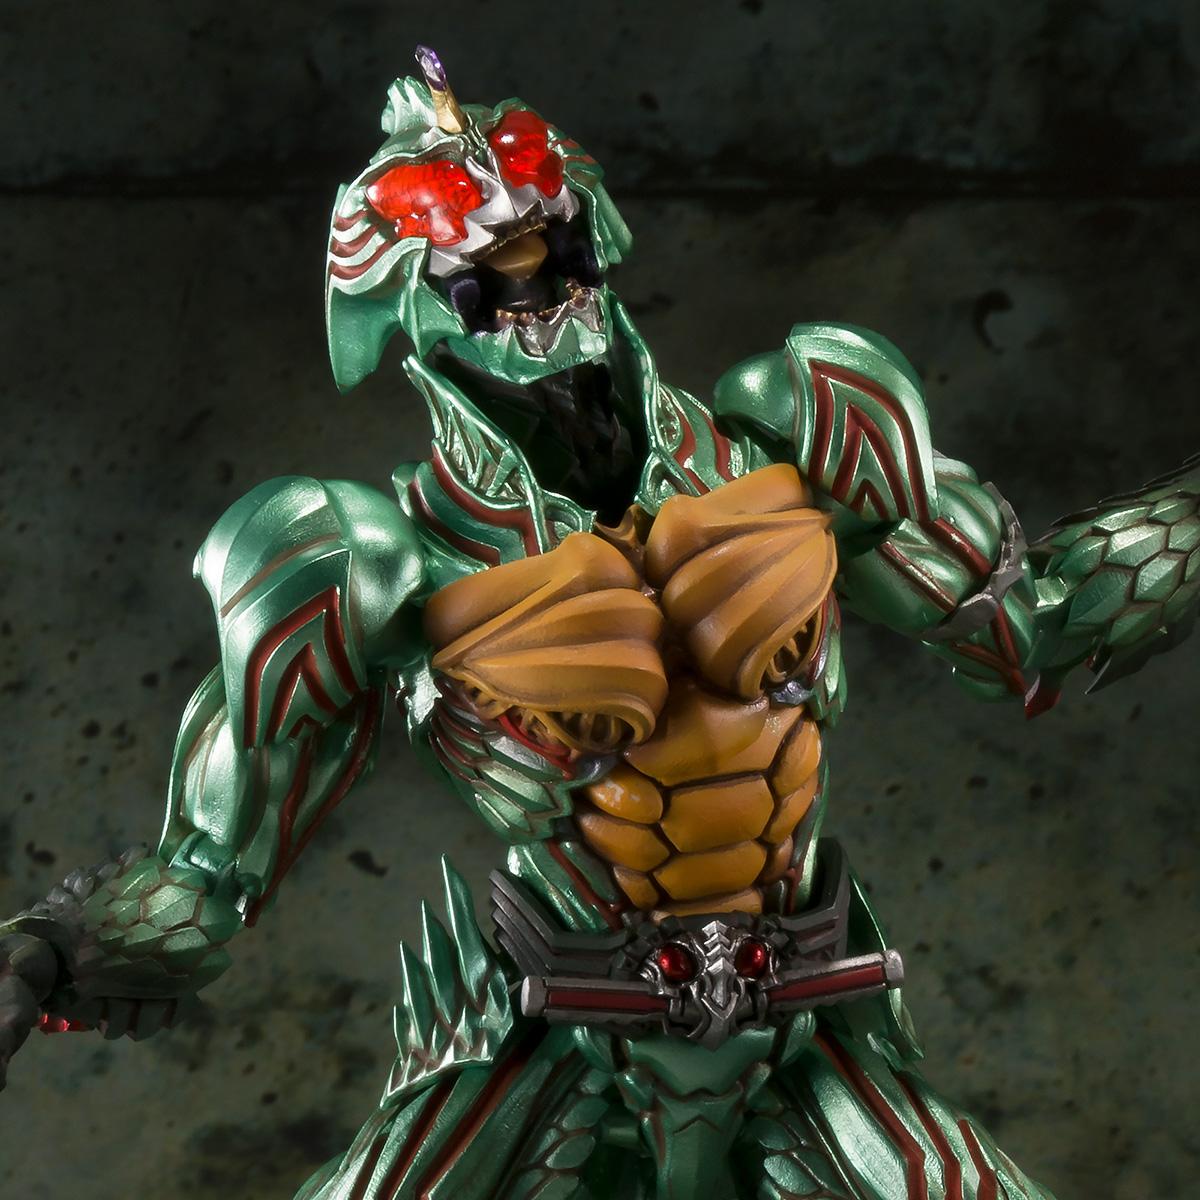 BANDAI S.I.C Masked Kamen Rider Amazons AMAZON ALFA Amazon.co.jp Limited Figure